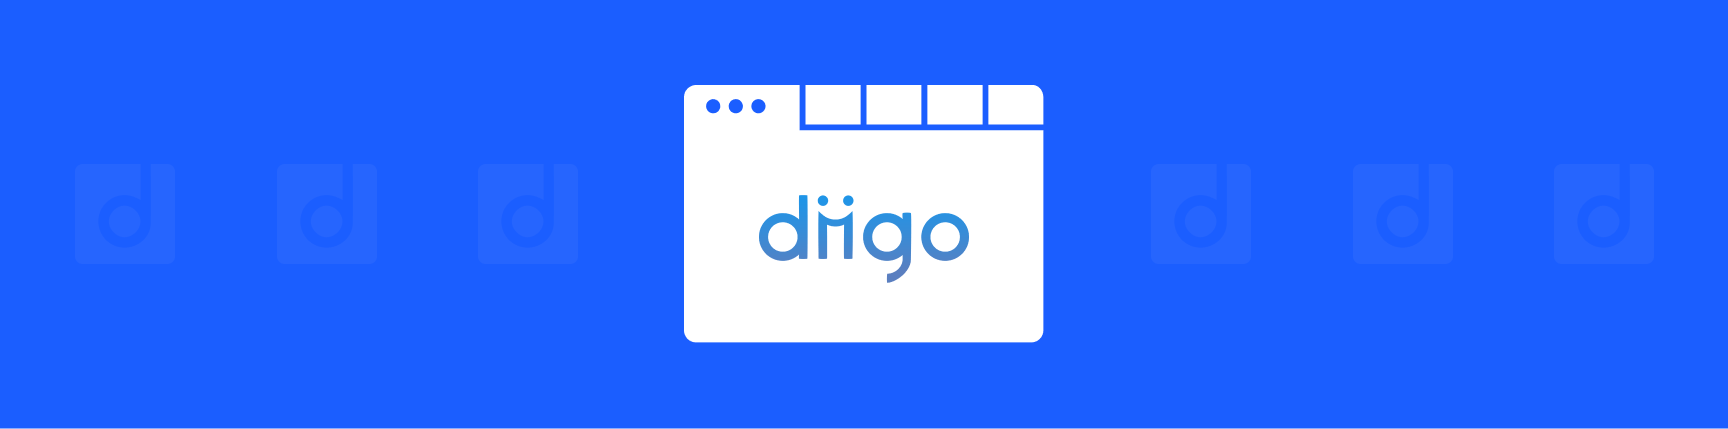 Diigo logo in a browser window with a blue background